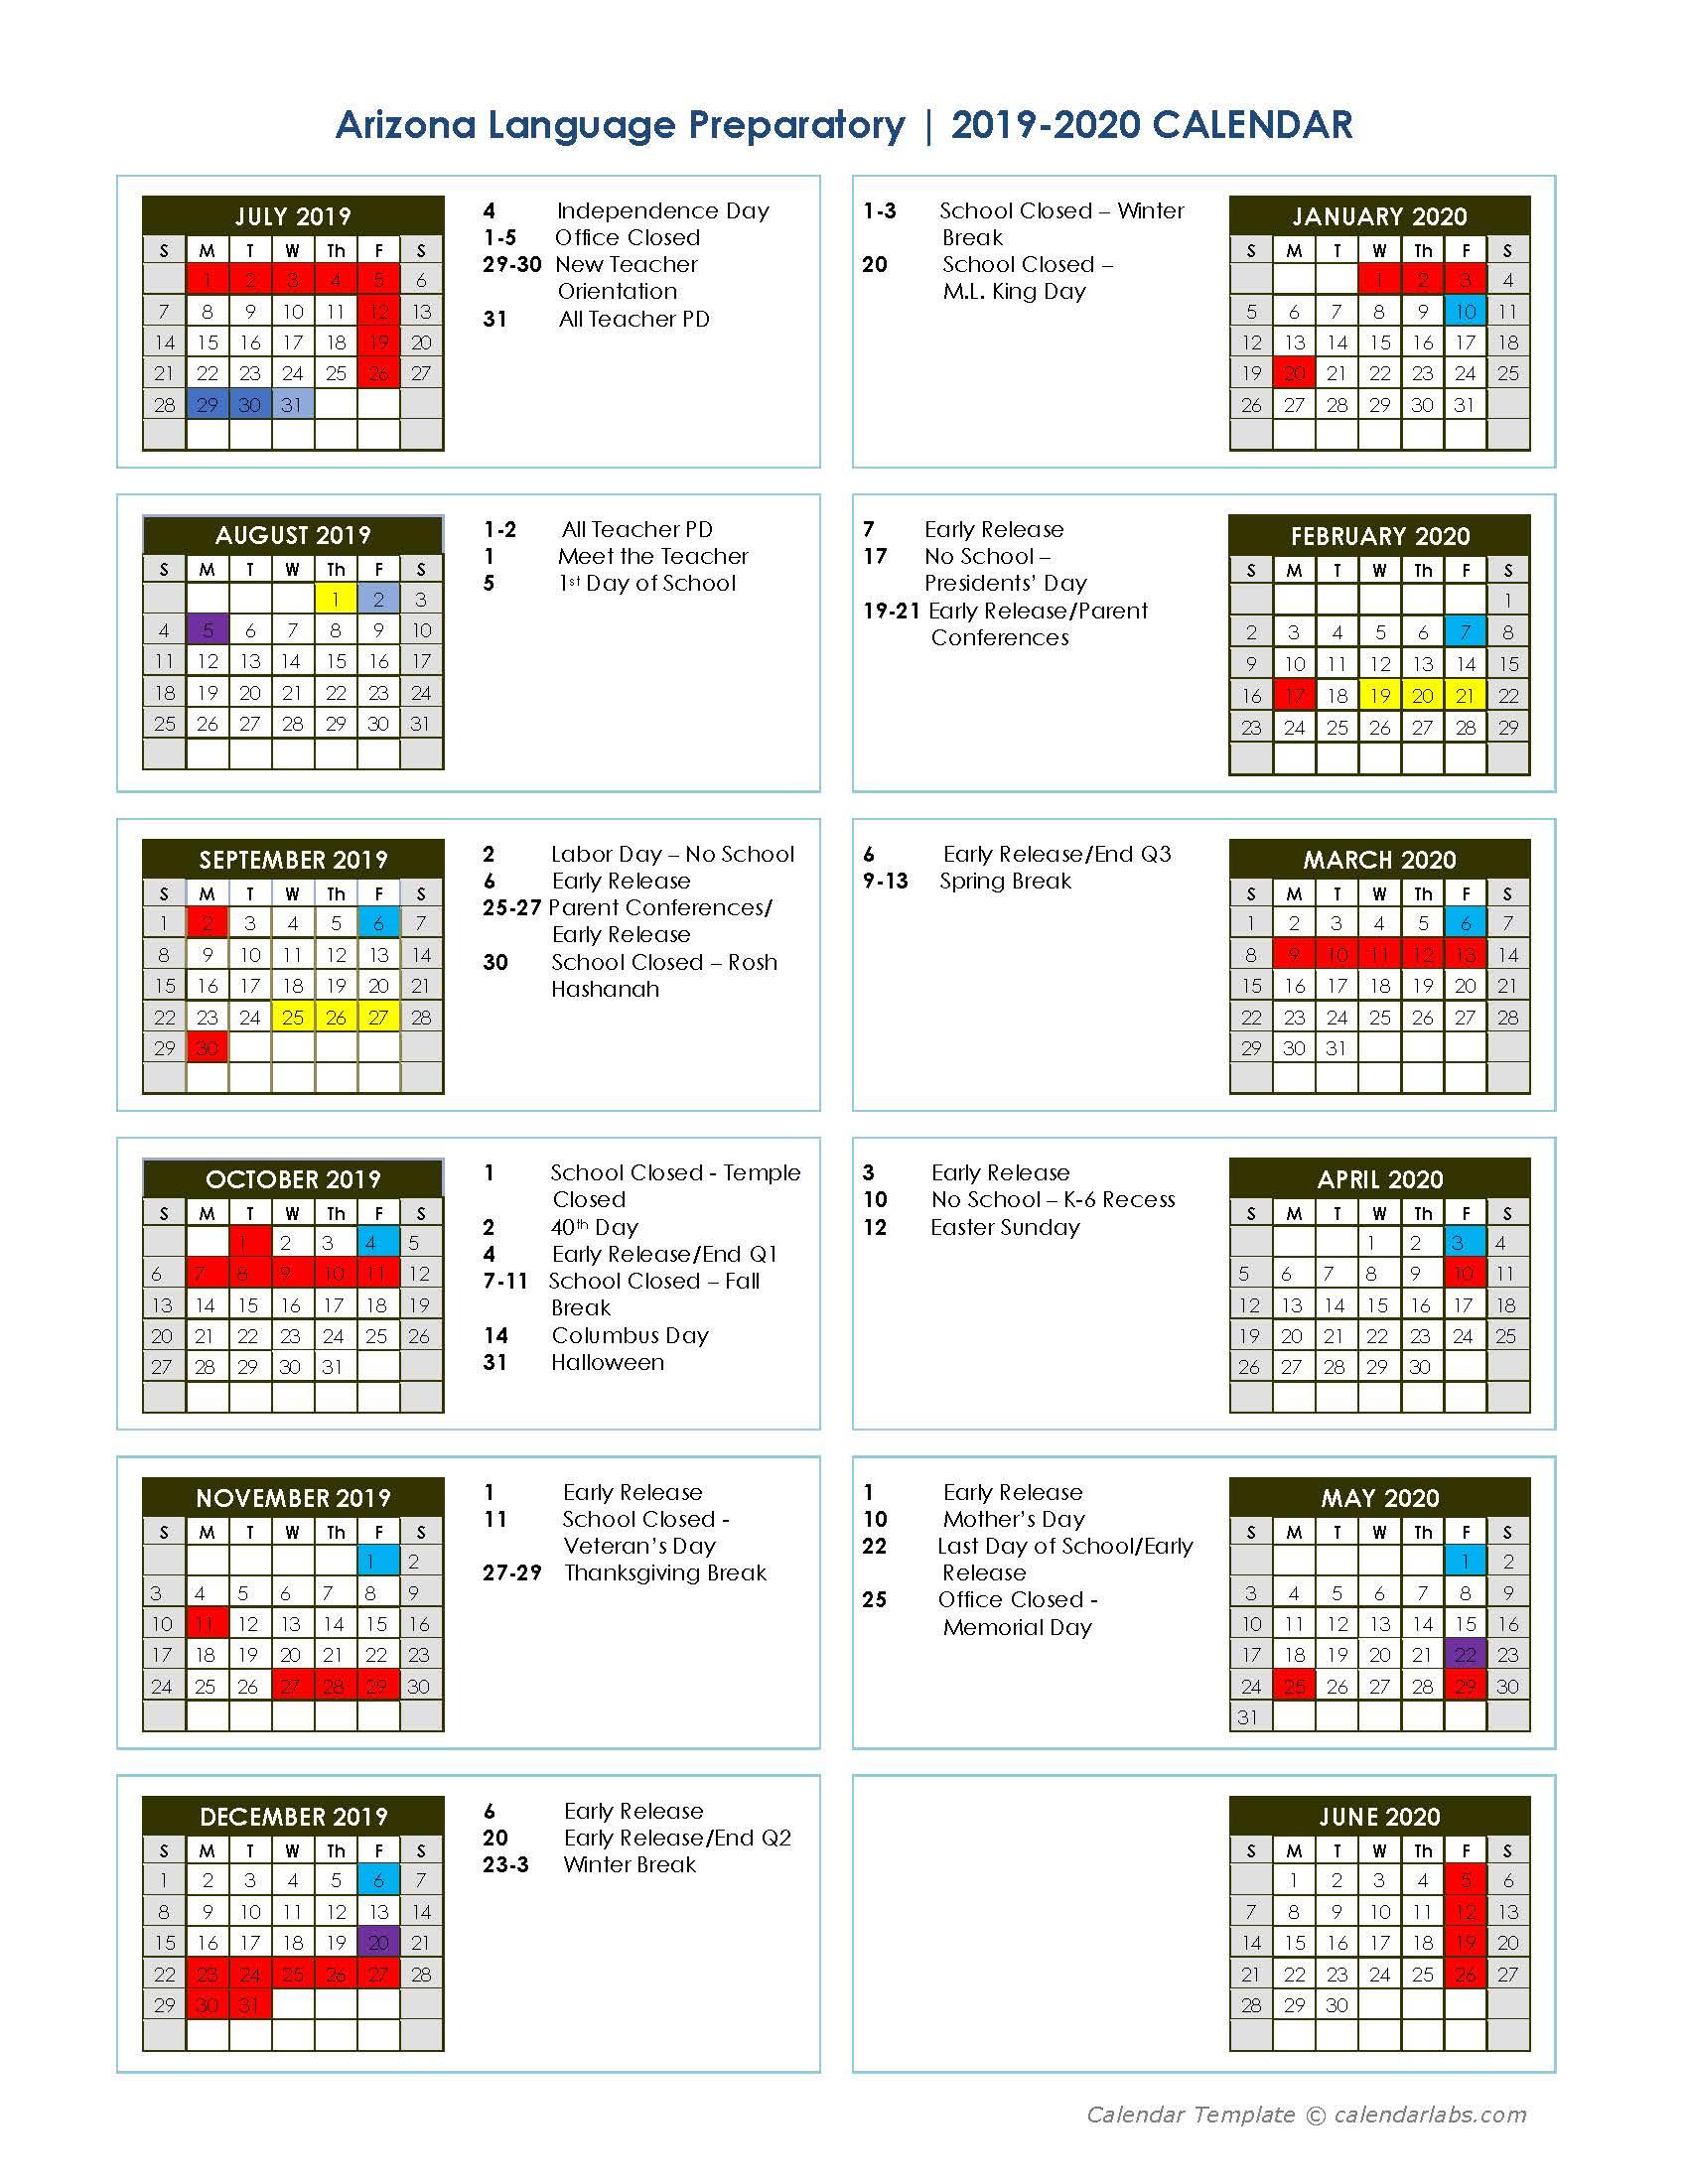 2019-2020 School Calendar - Arizona Language Preparatory